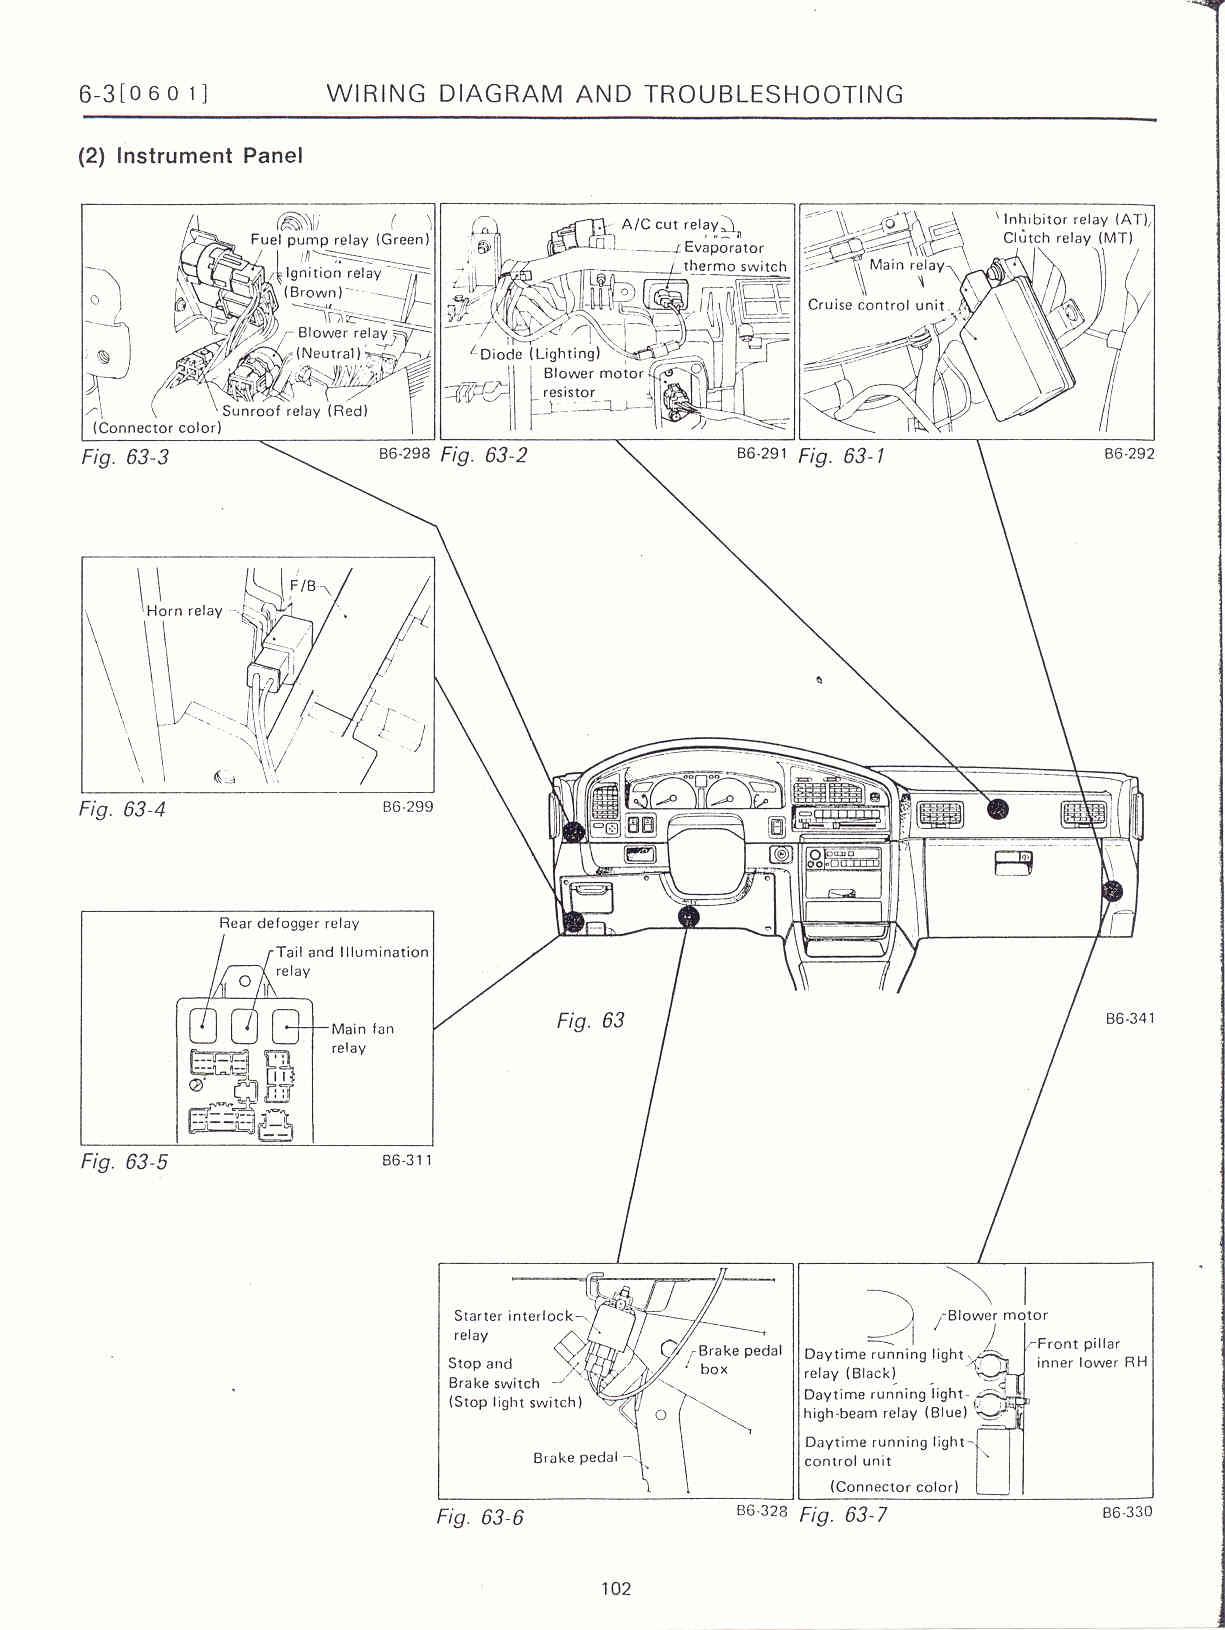 Relay engine room · instrument panel